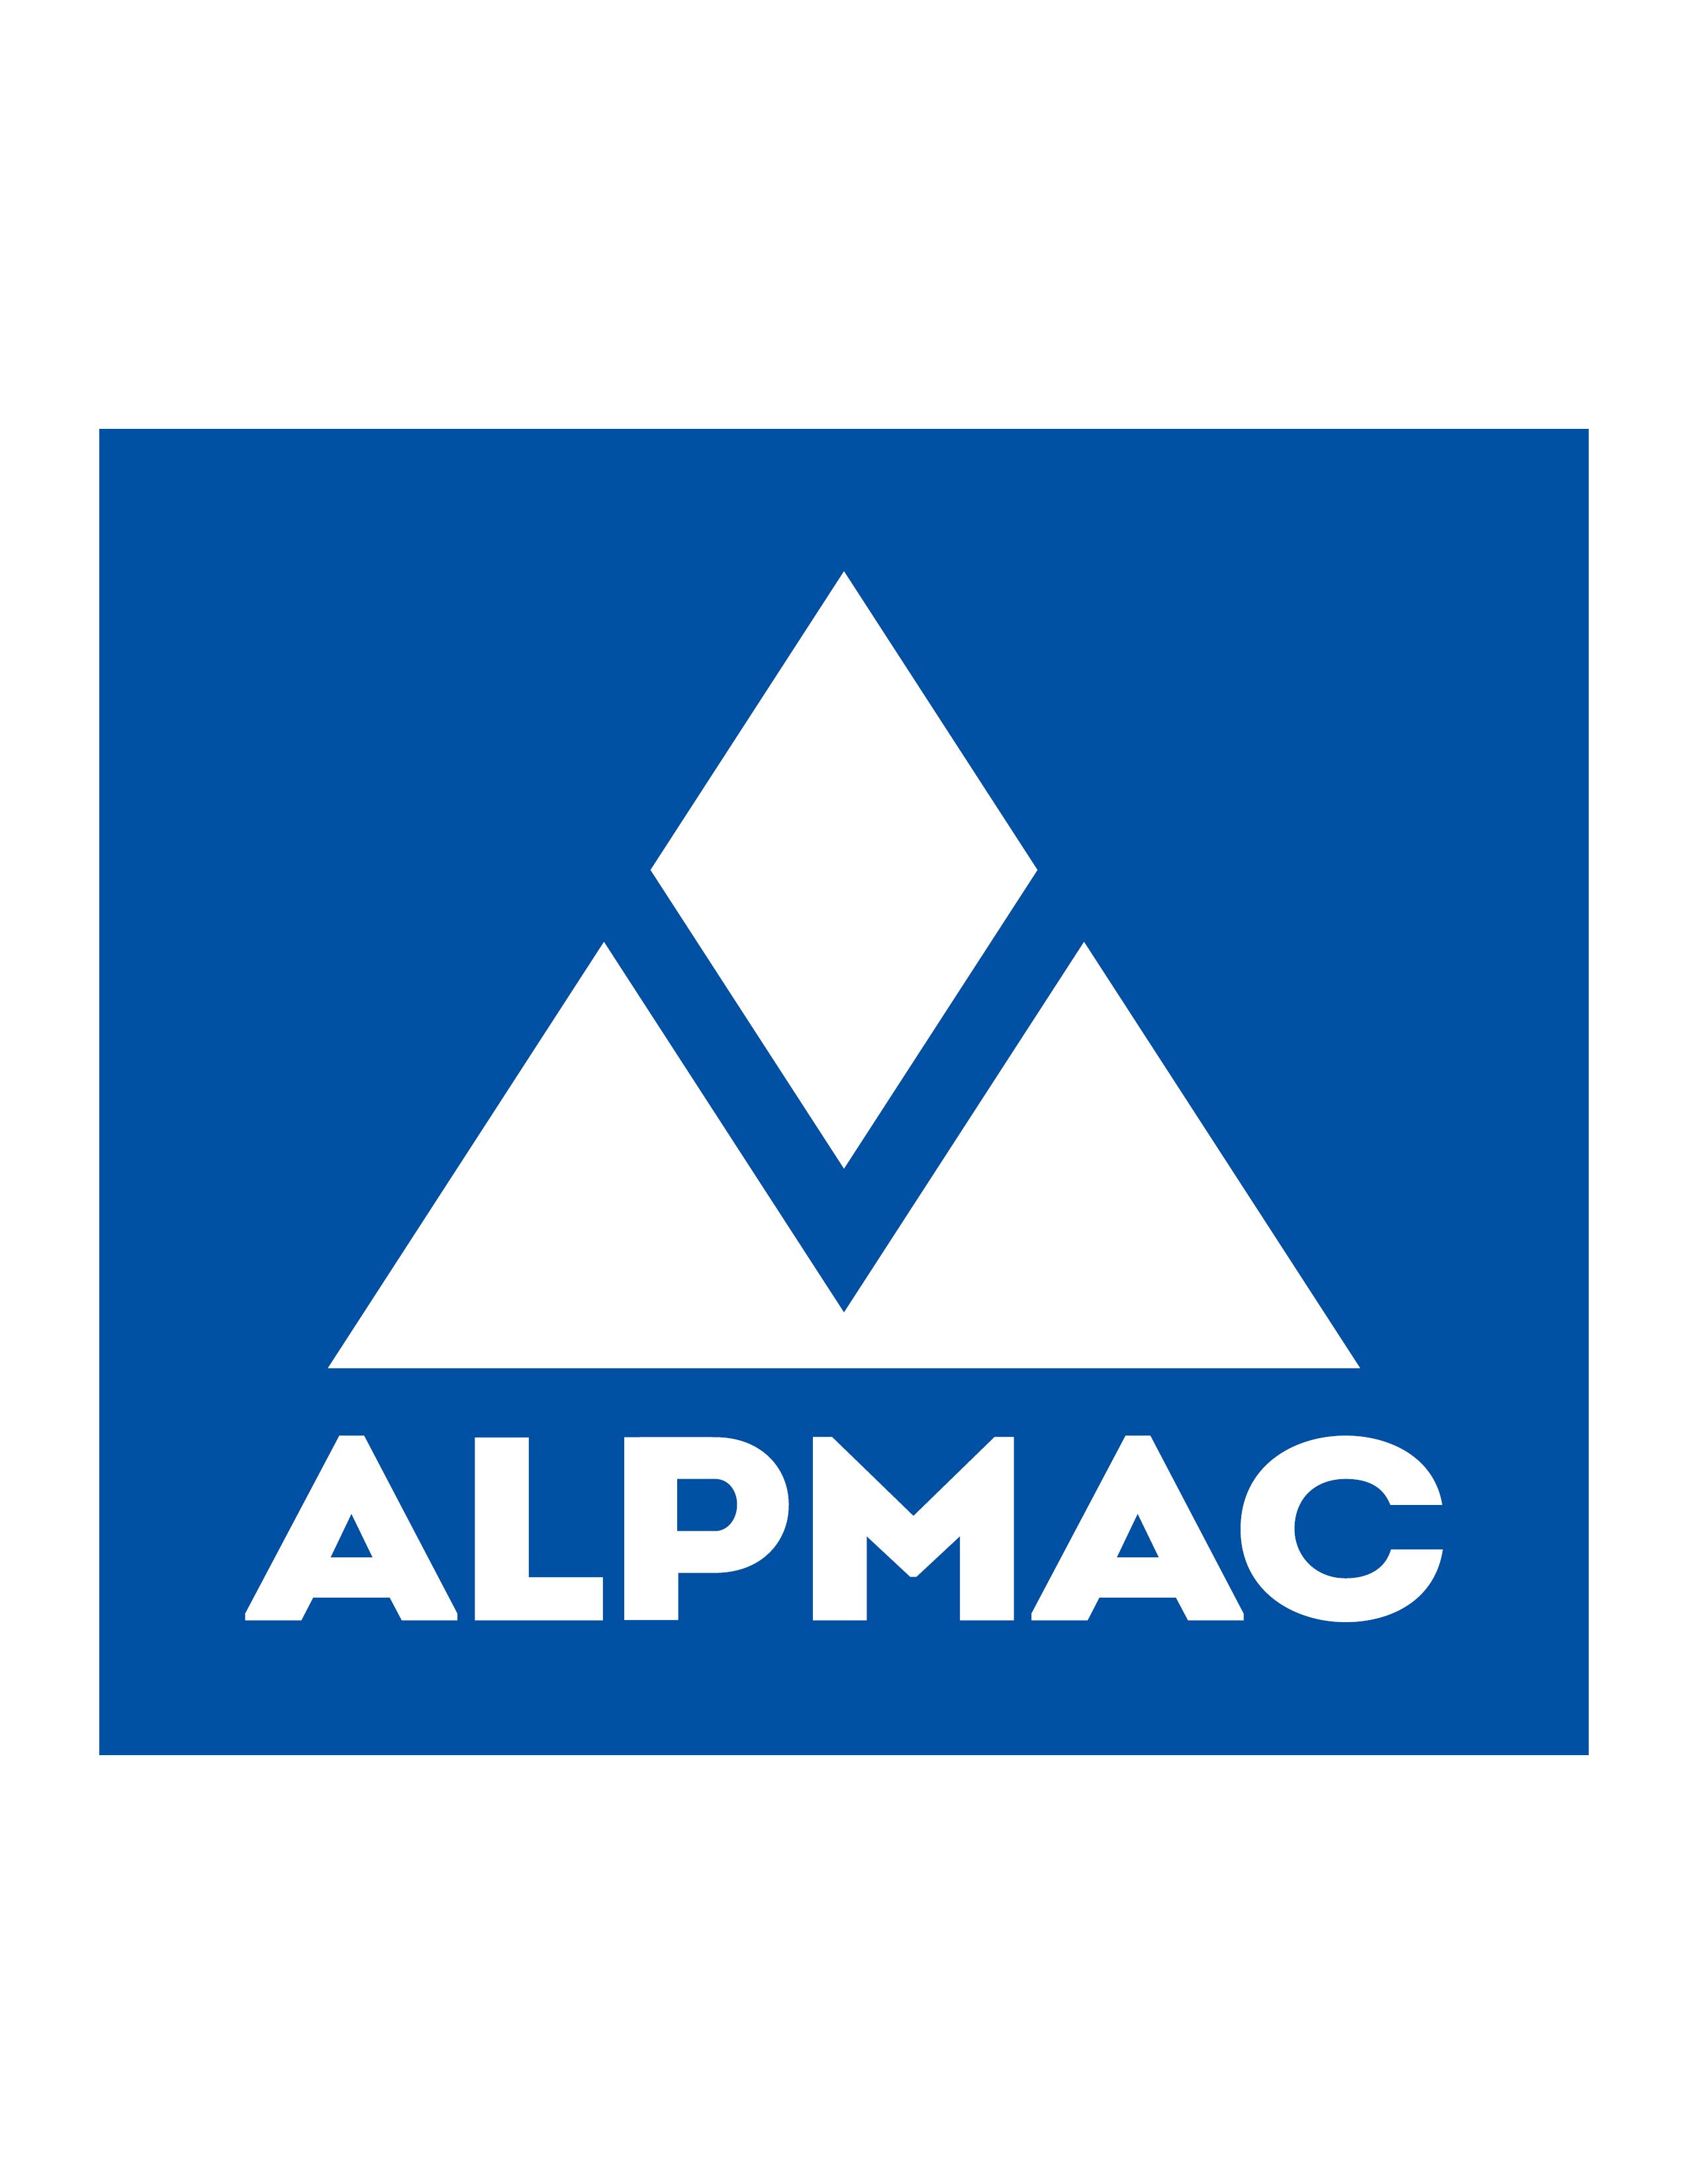 Alpmac